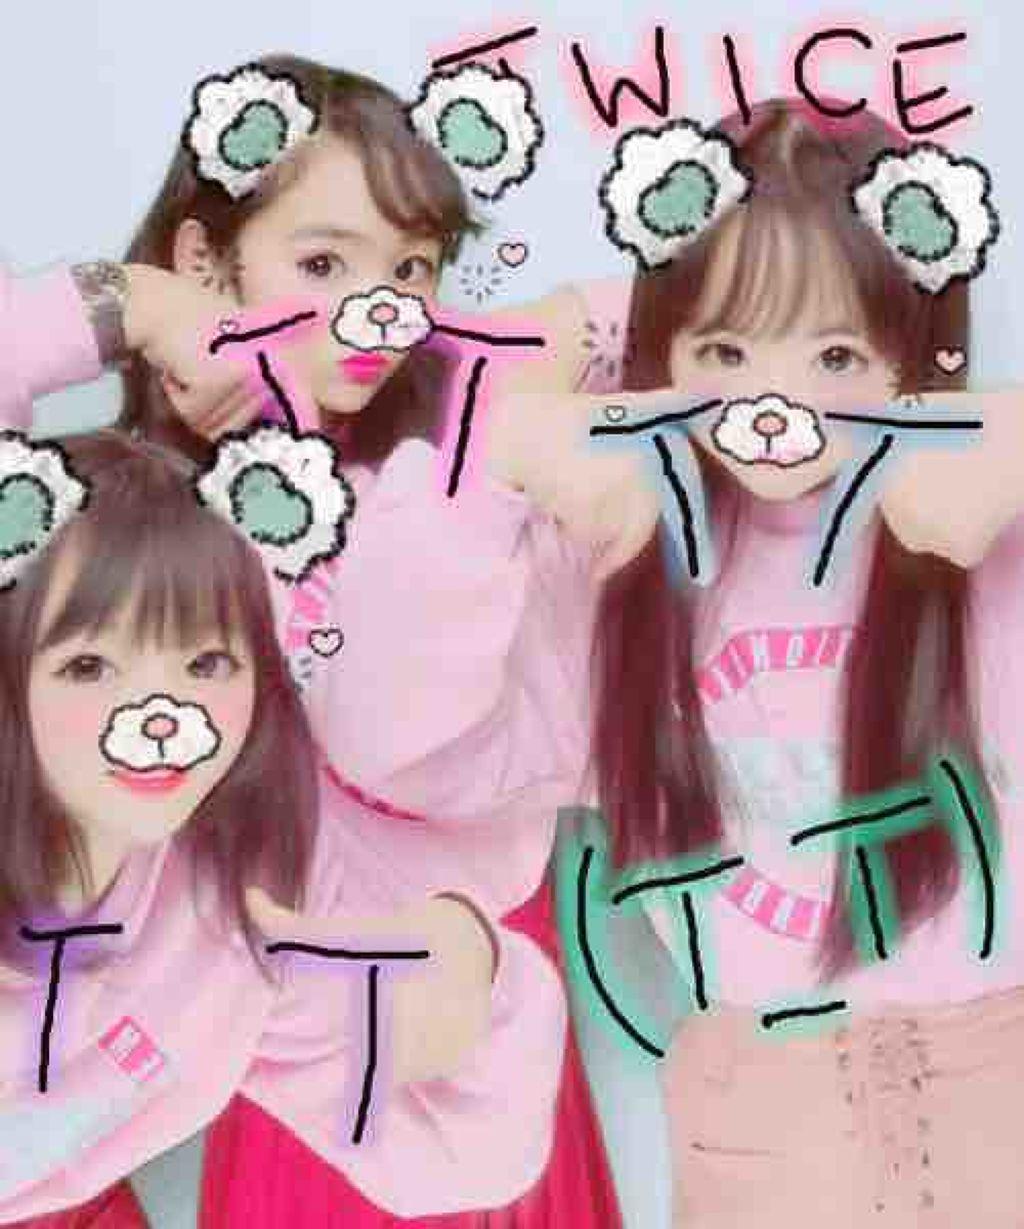 pink_blush_8kh